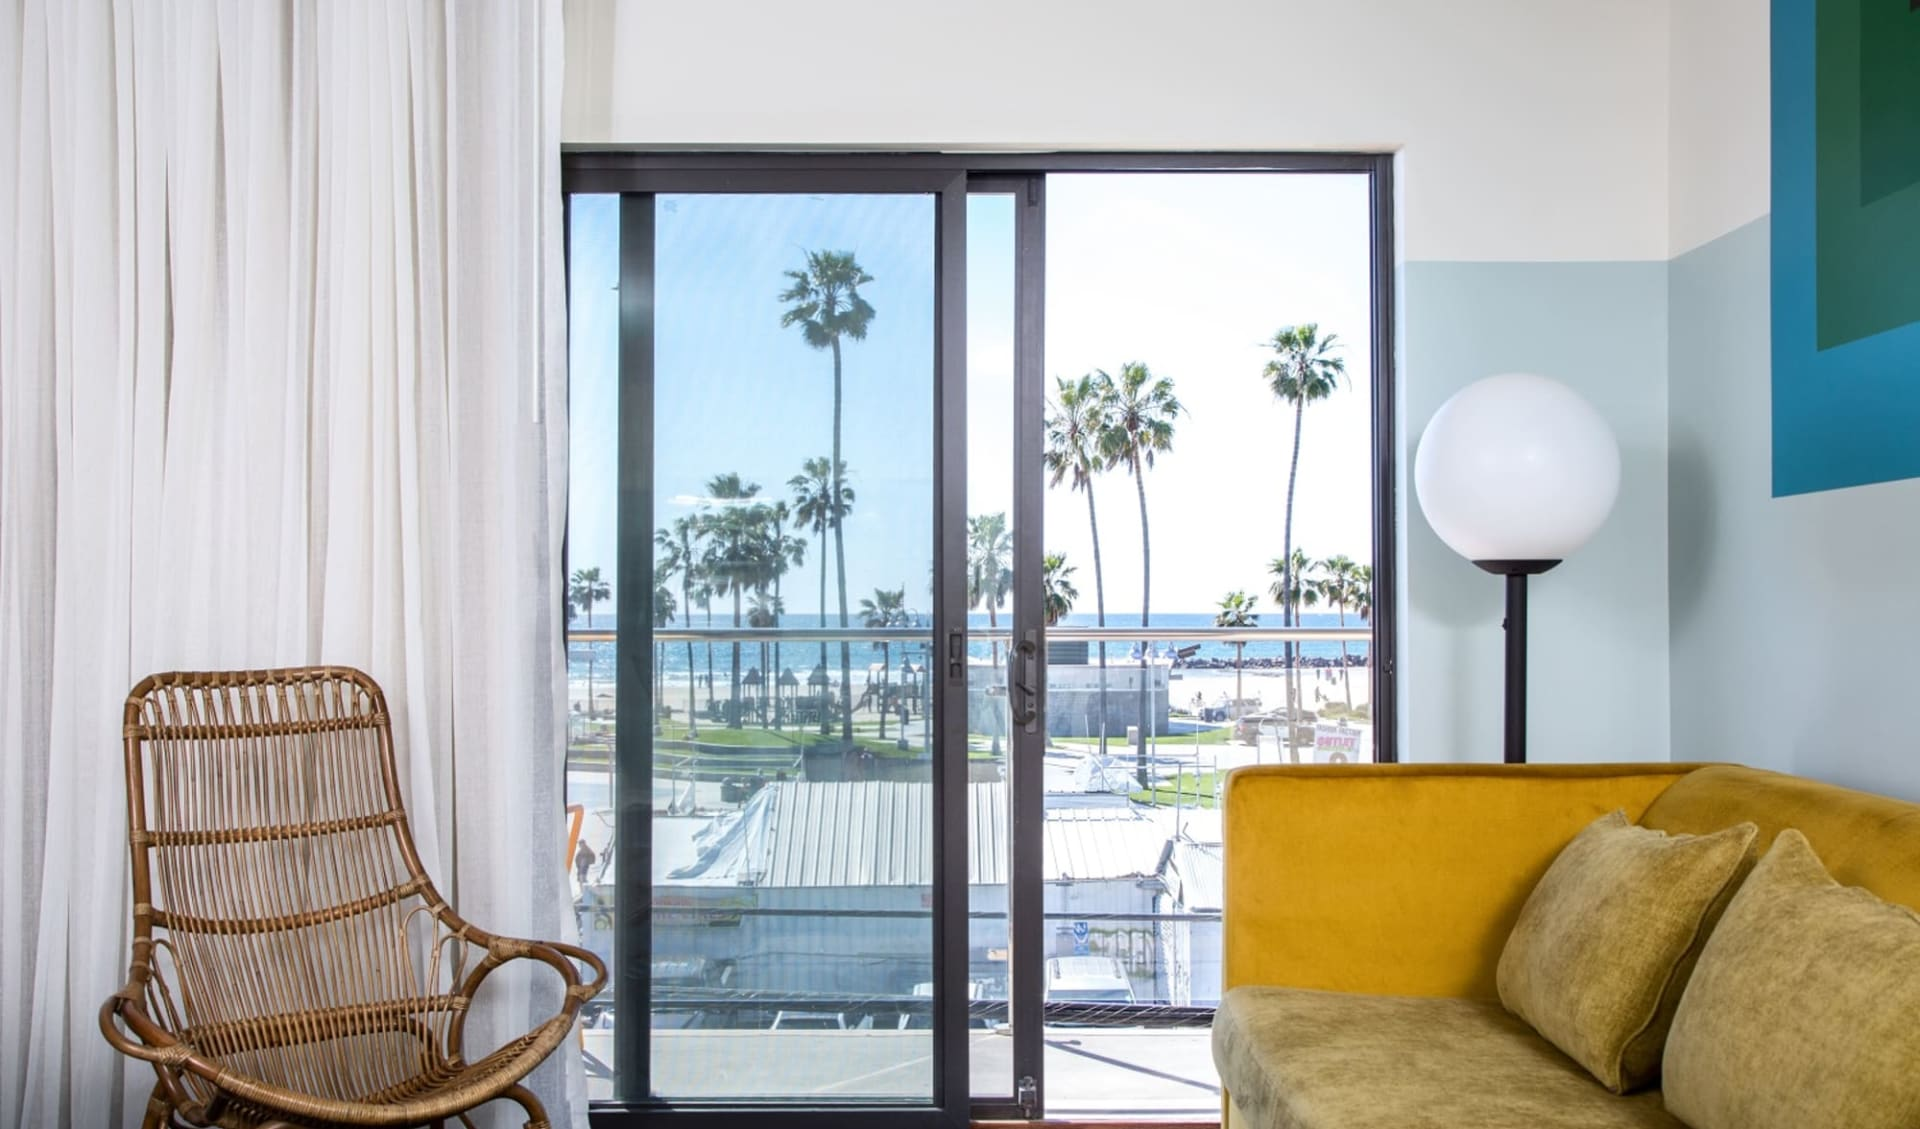 Hotel Erwin in Venice Beach:  Erwin - Ocean View